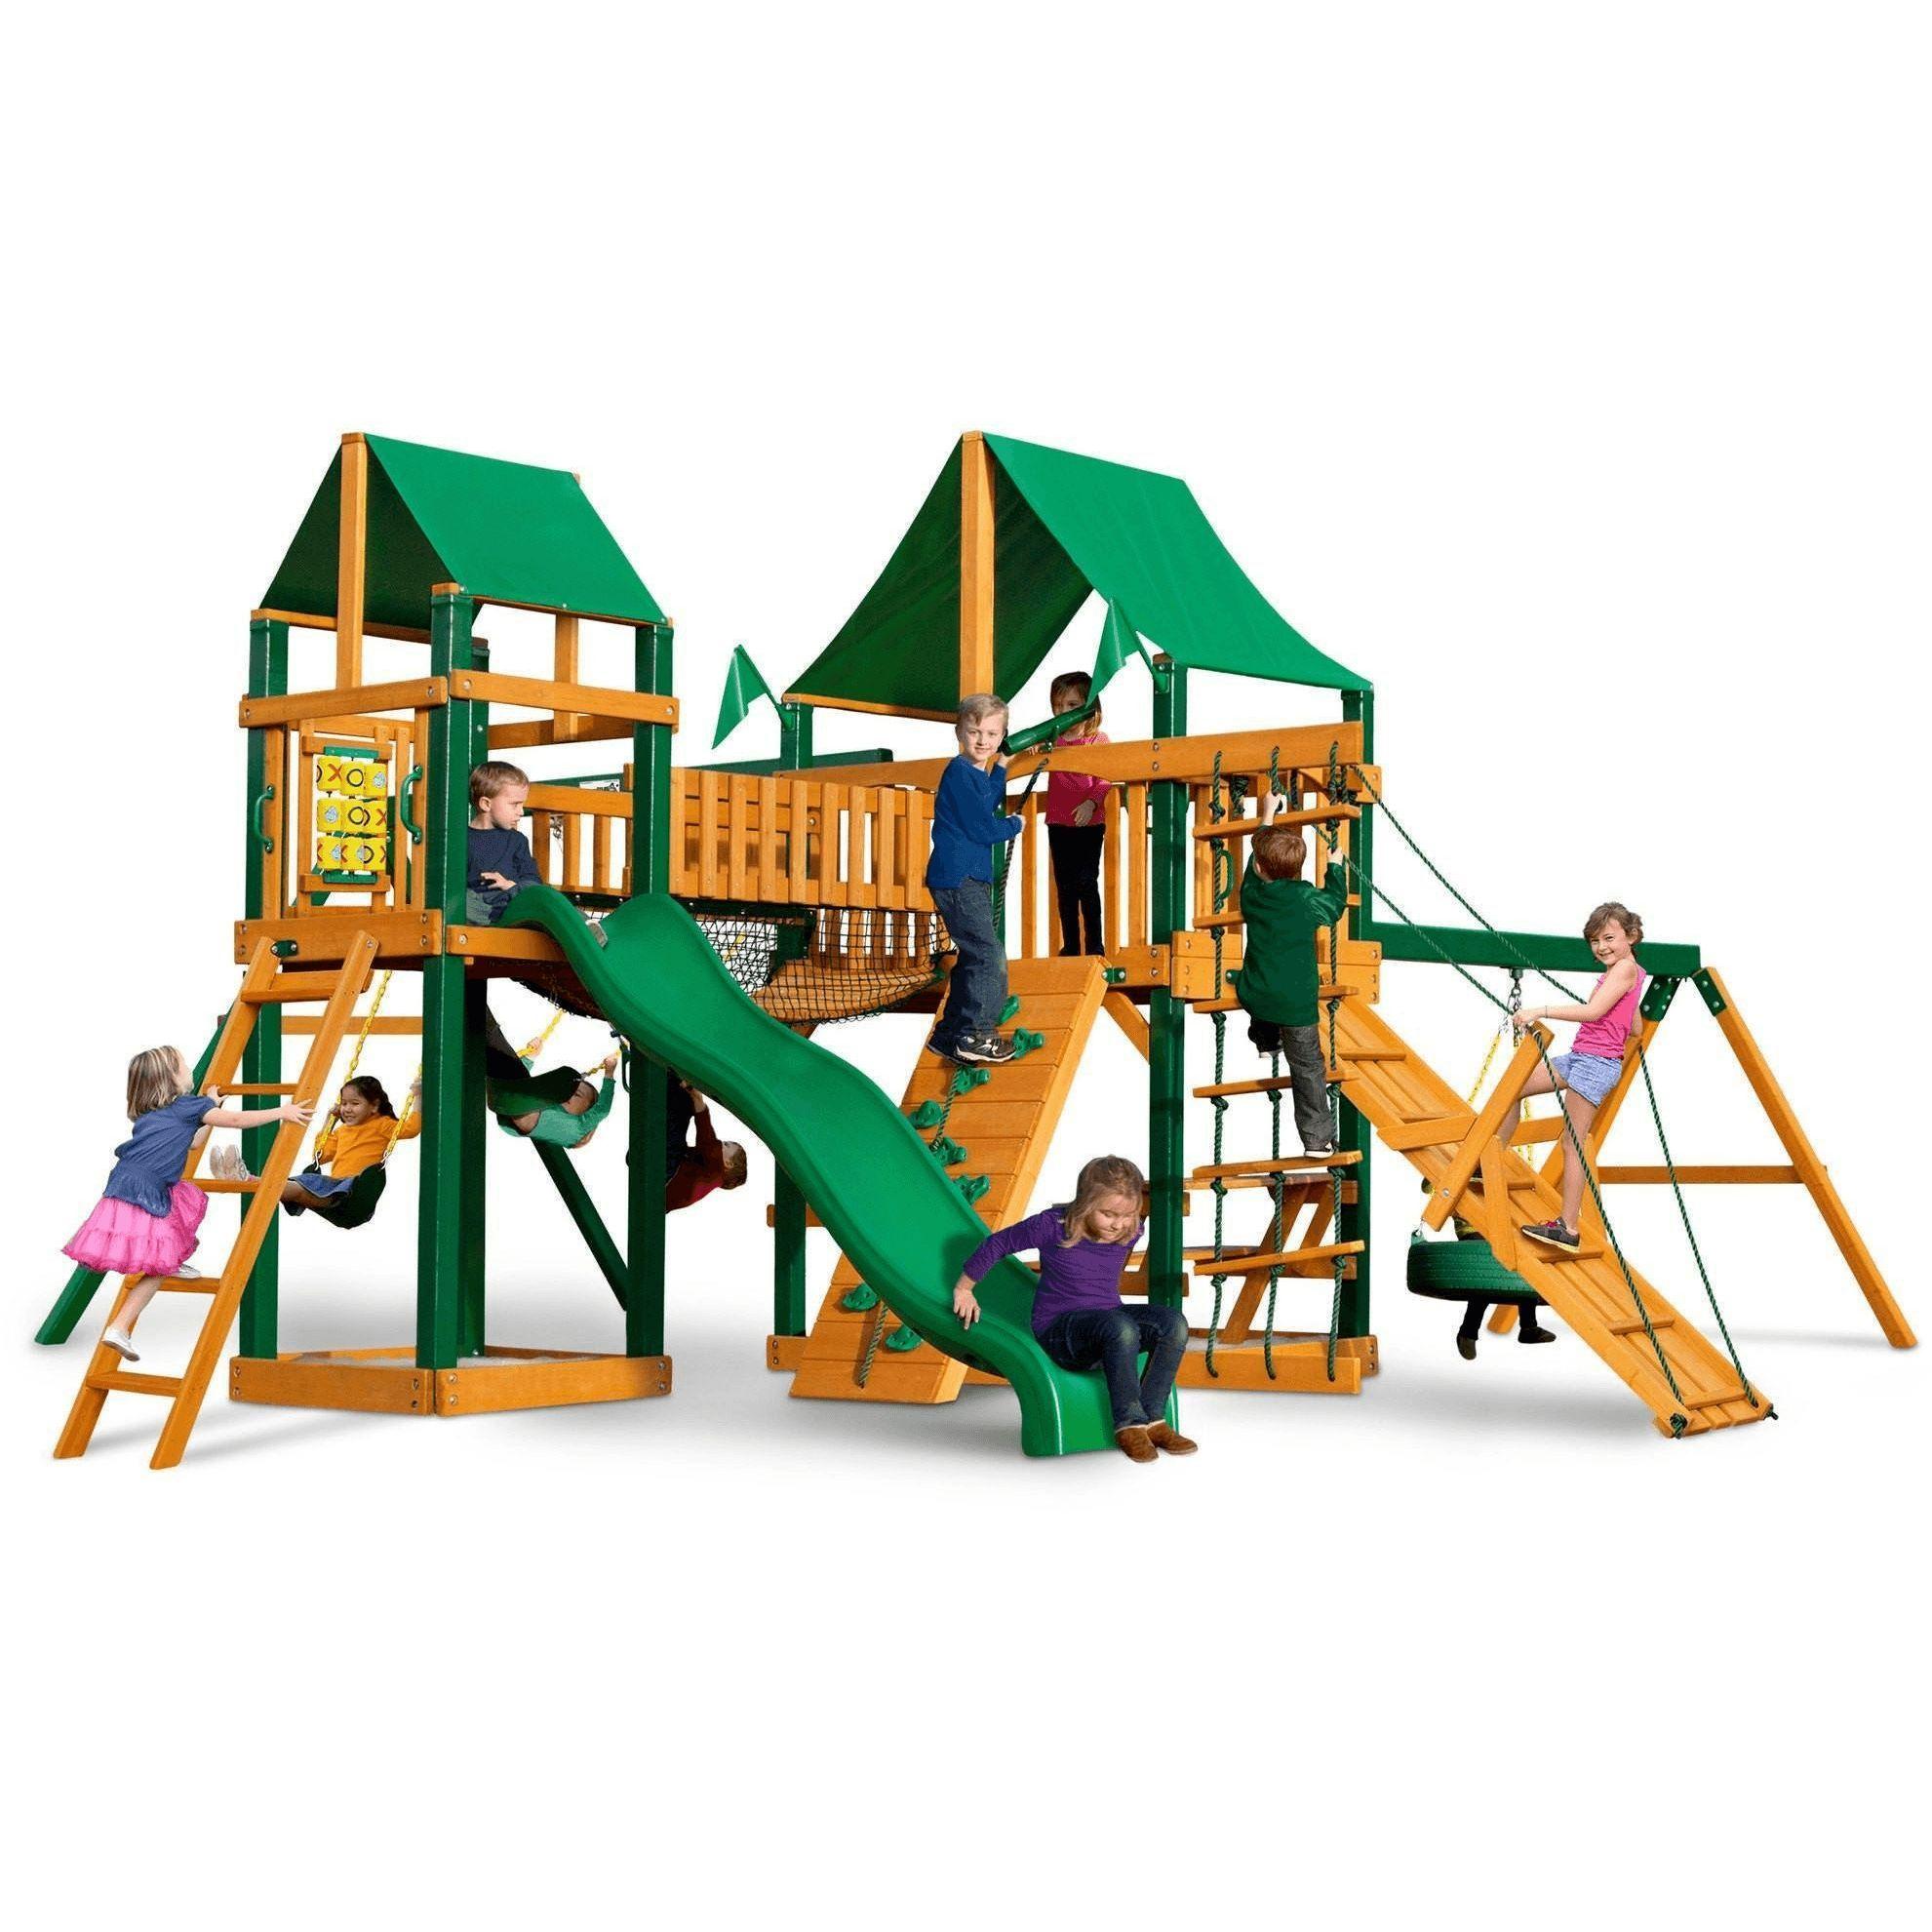 Pioneer Peak Swing Set Optional Treehouse And Fort